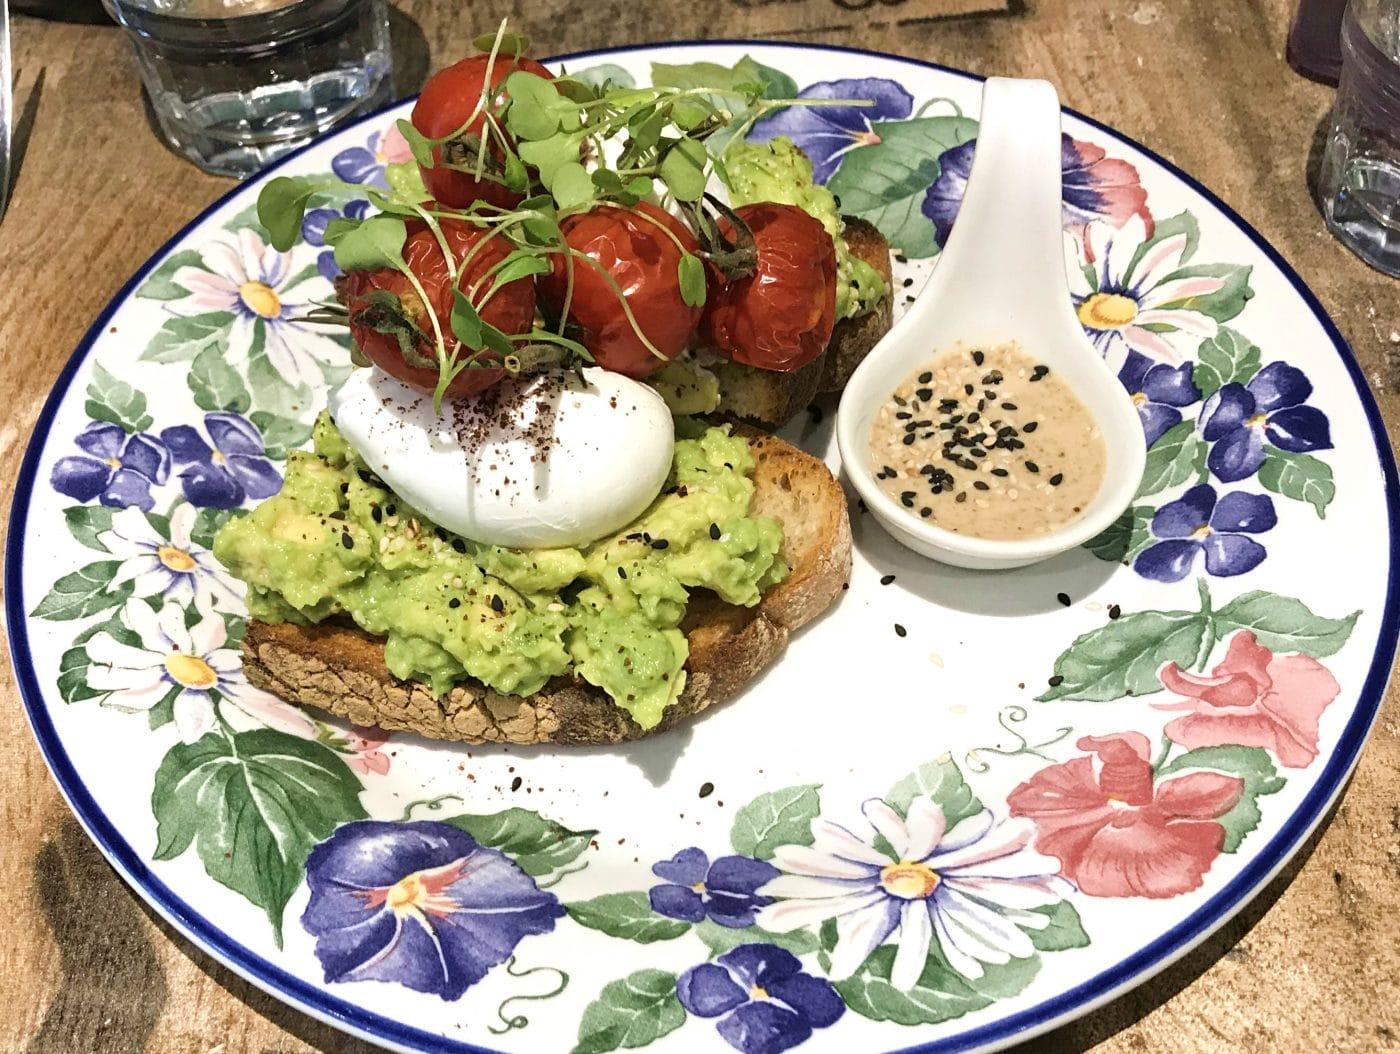 Enjoy brunch at Lowry & Baker, Portobello Road